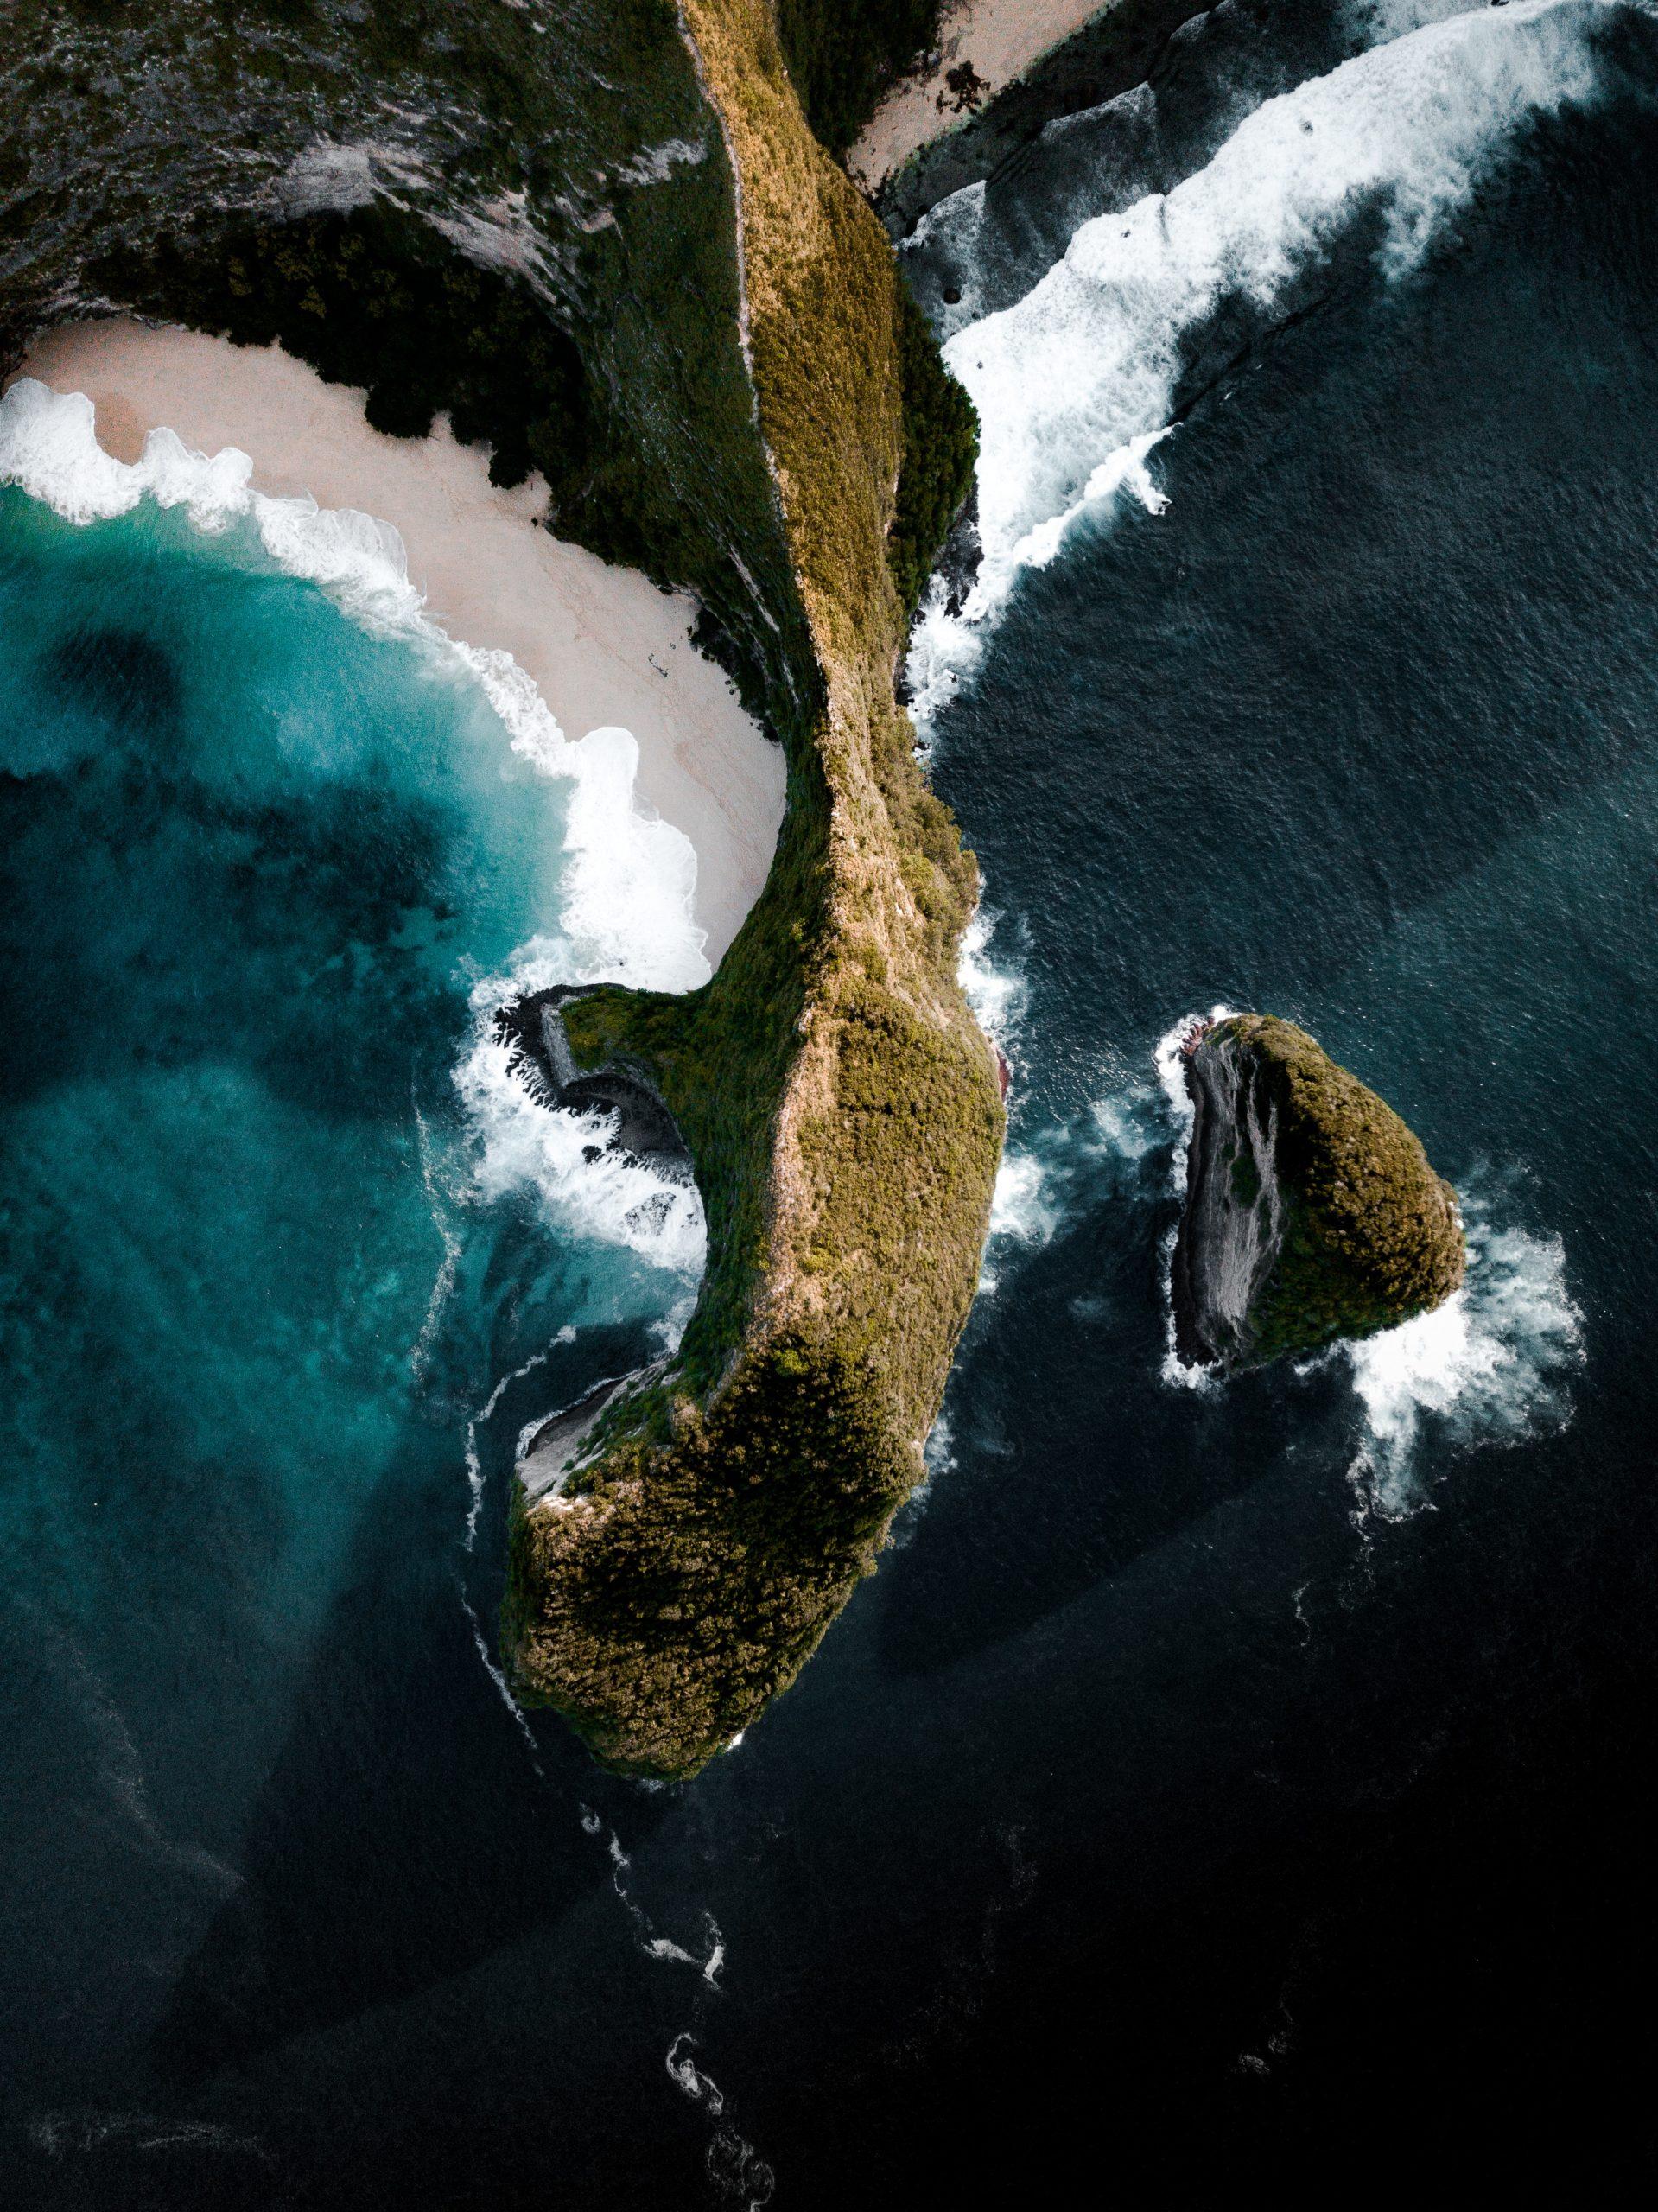 aerial-shot-of-an-island-3393444